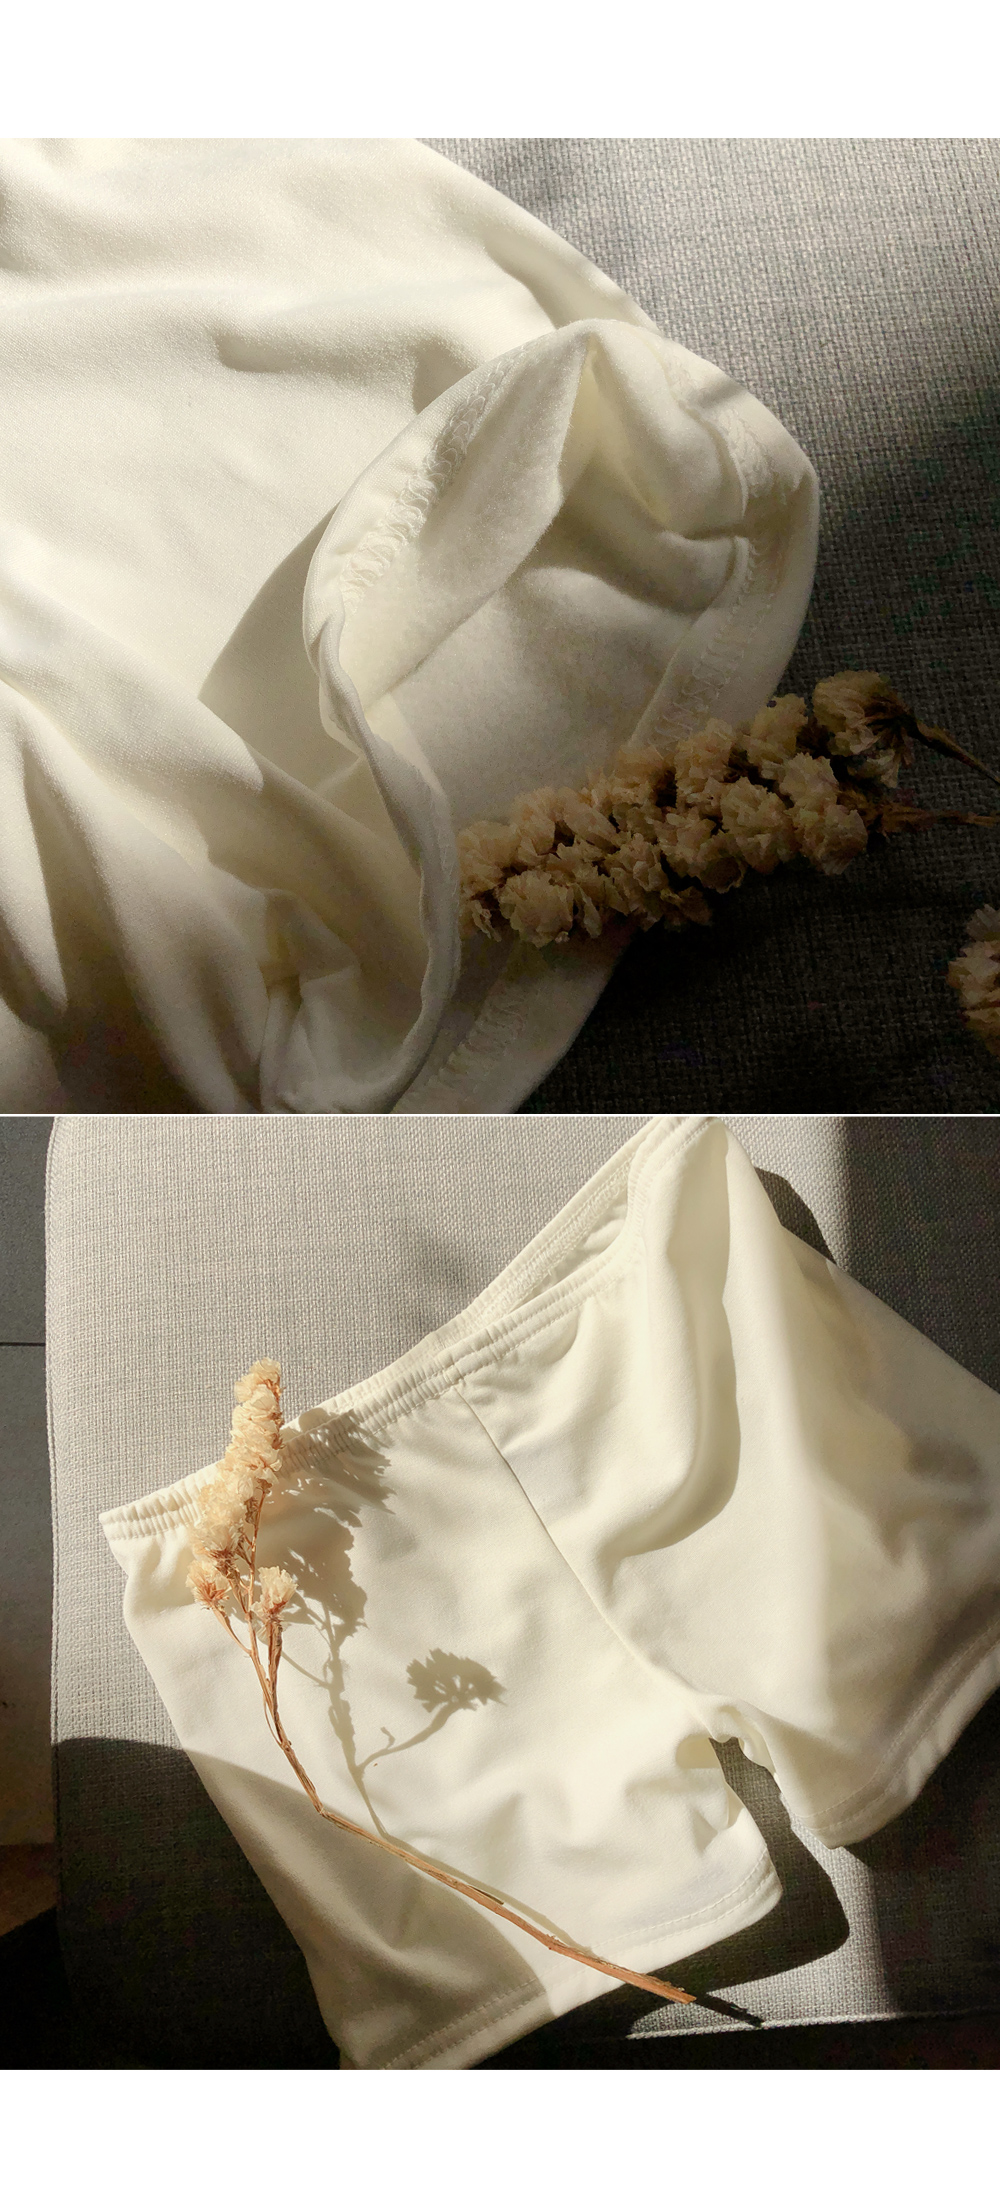 Winter Daily Raising Underpants